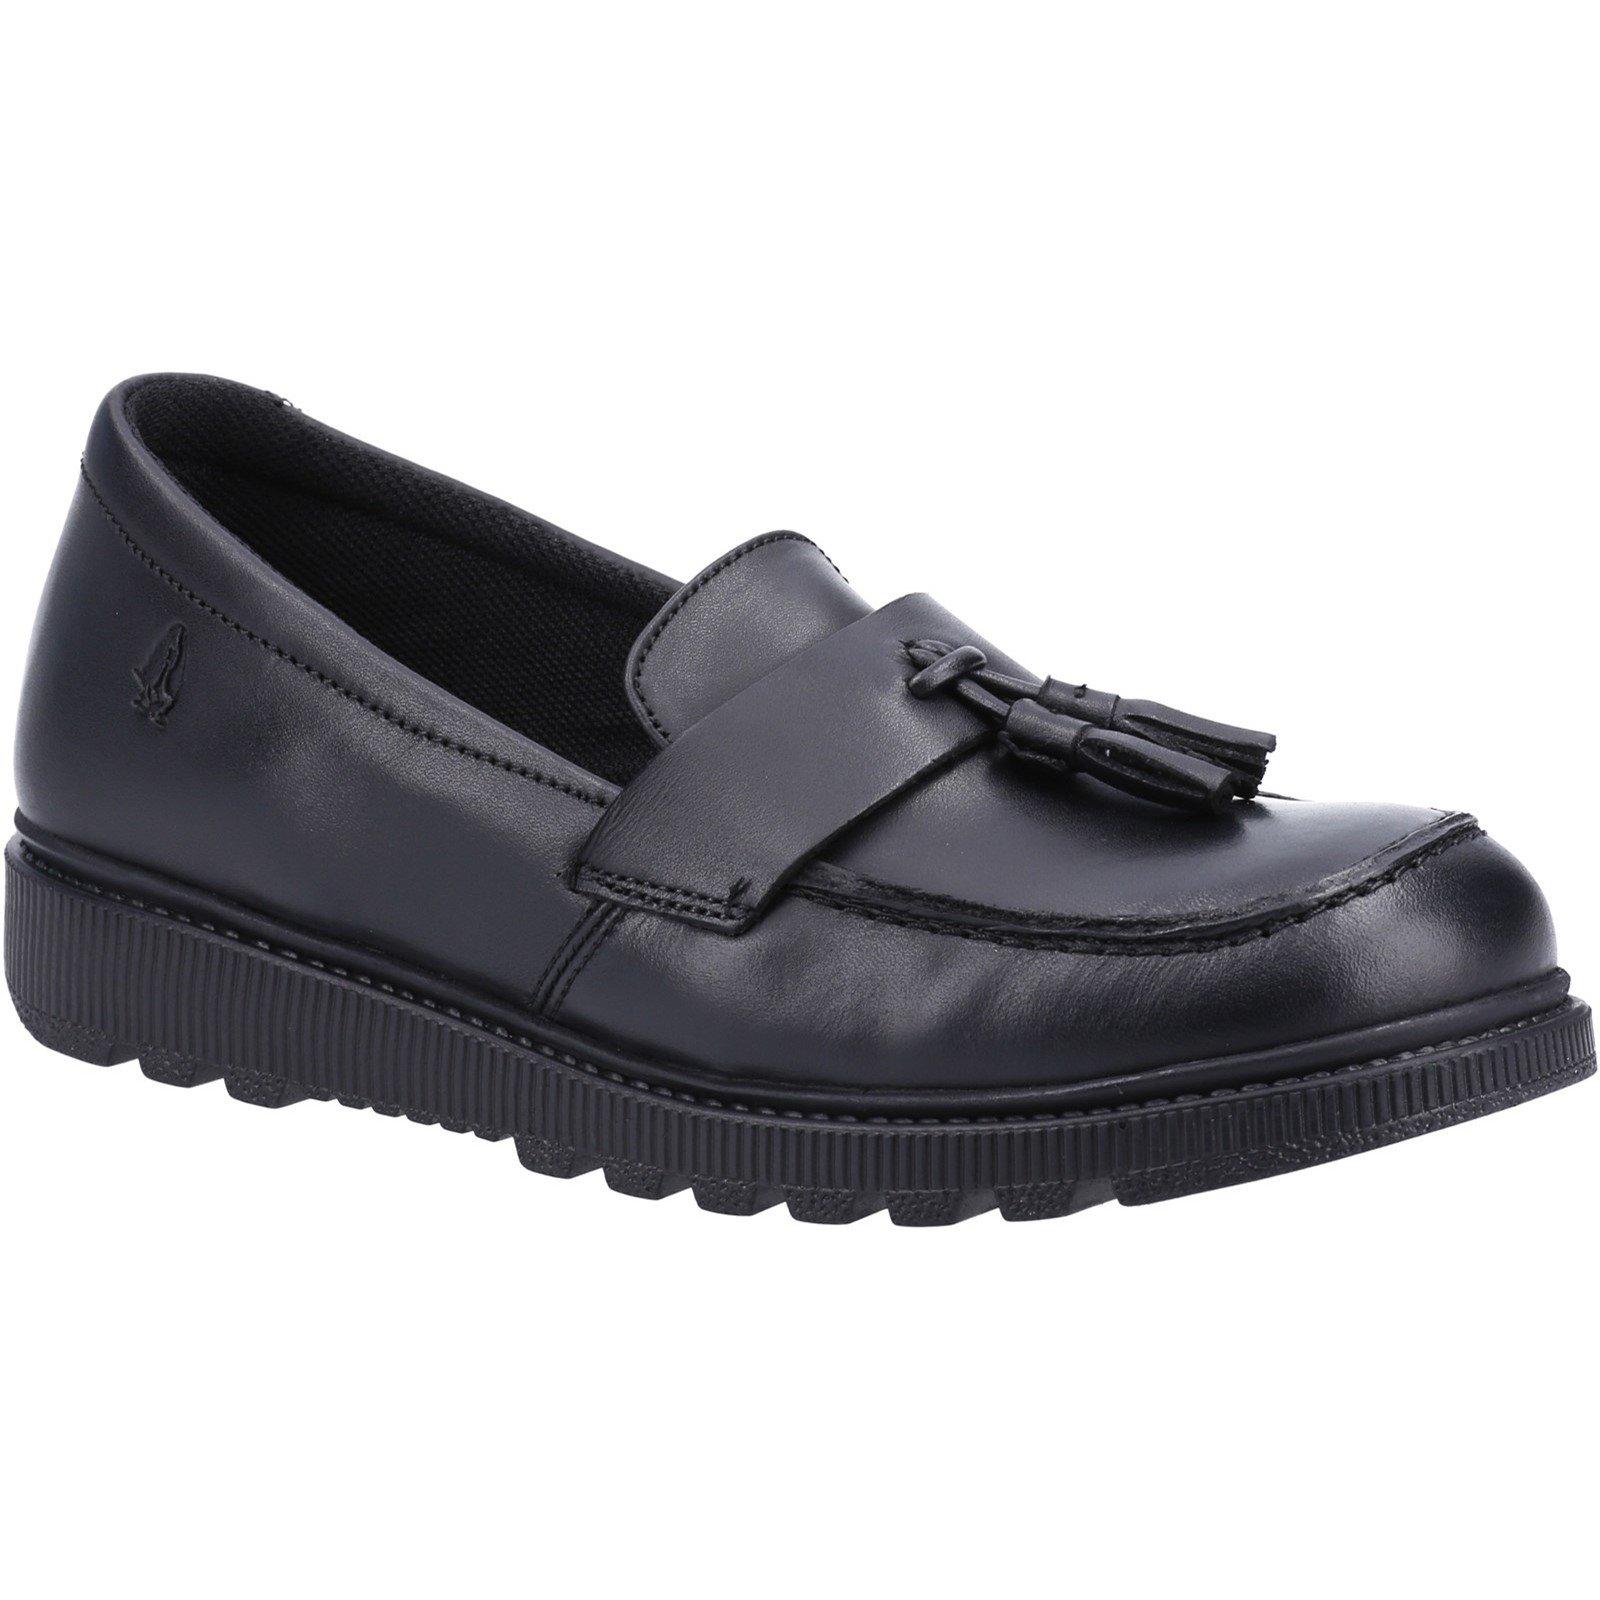 Hush Puppies Kid's Faye Junior School Shoe Black 30843 - Black 2